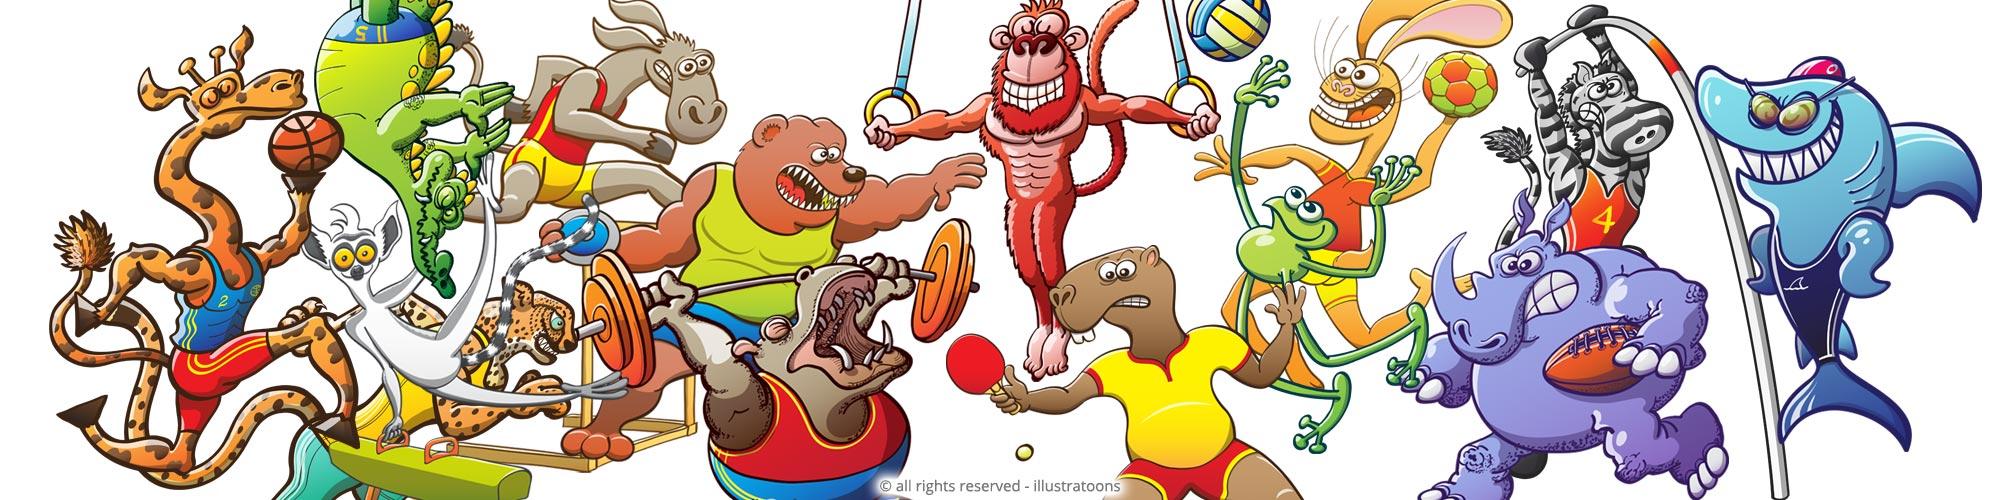 Illustratoons-Sports-Animals-Gallery